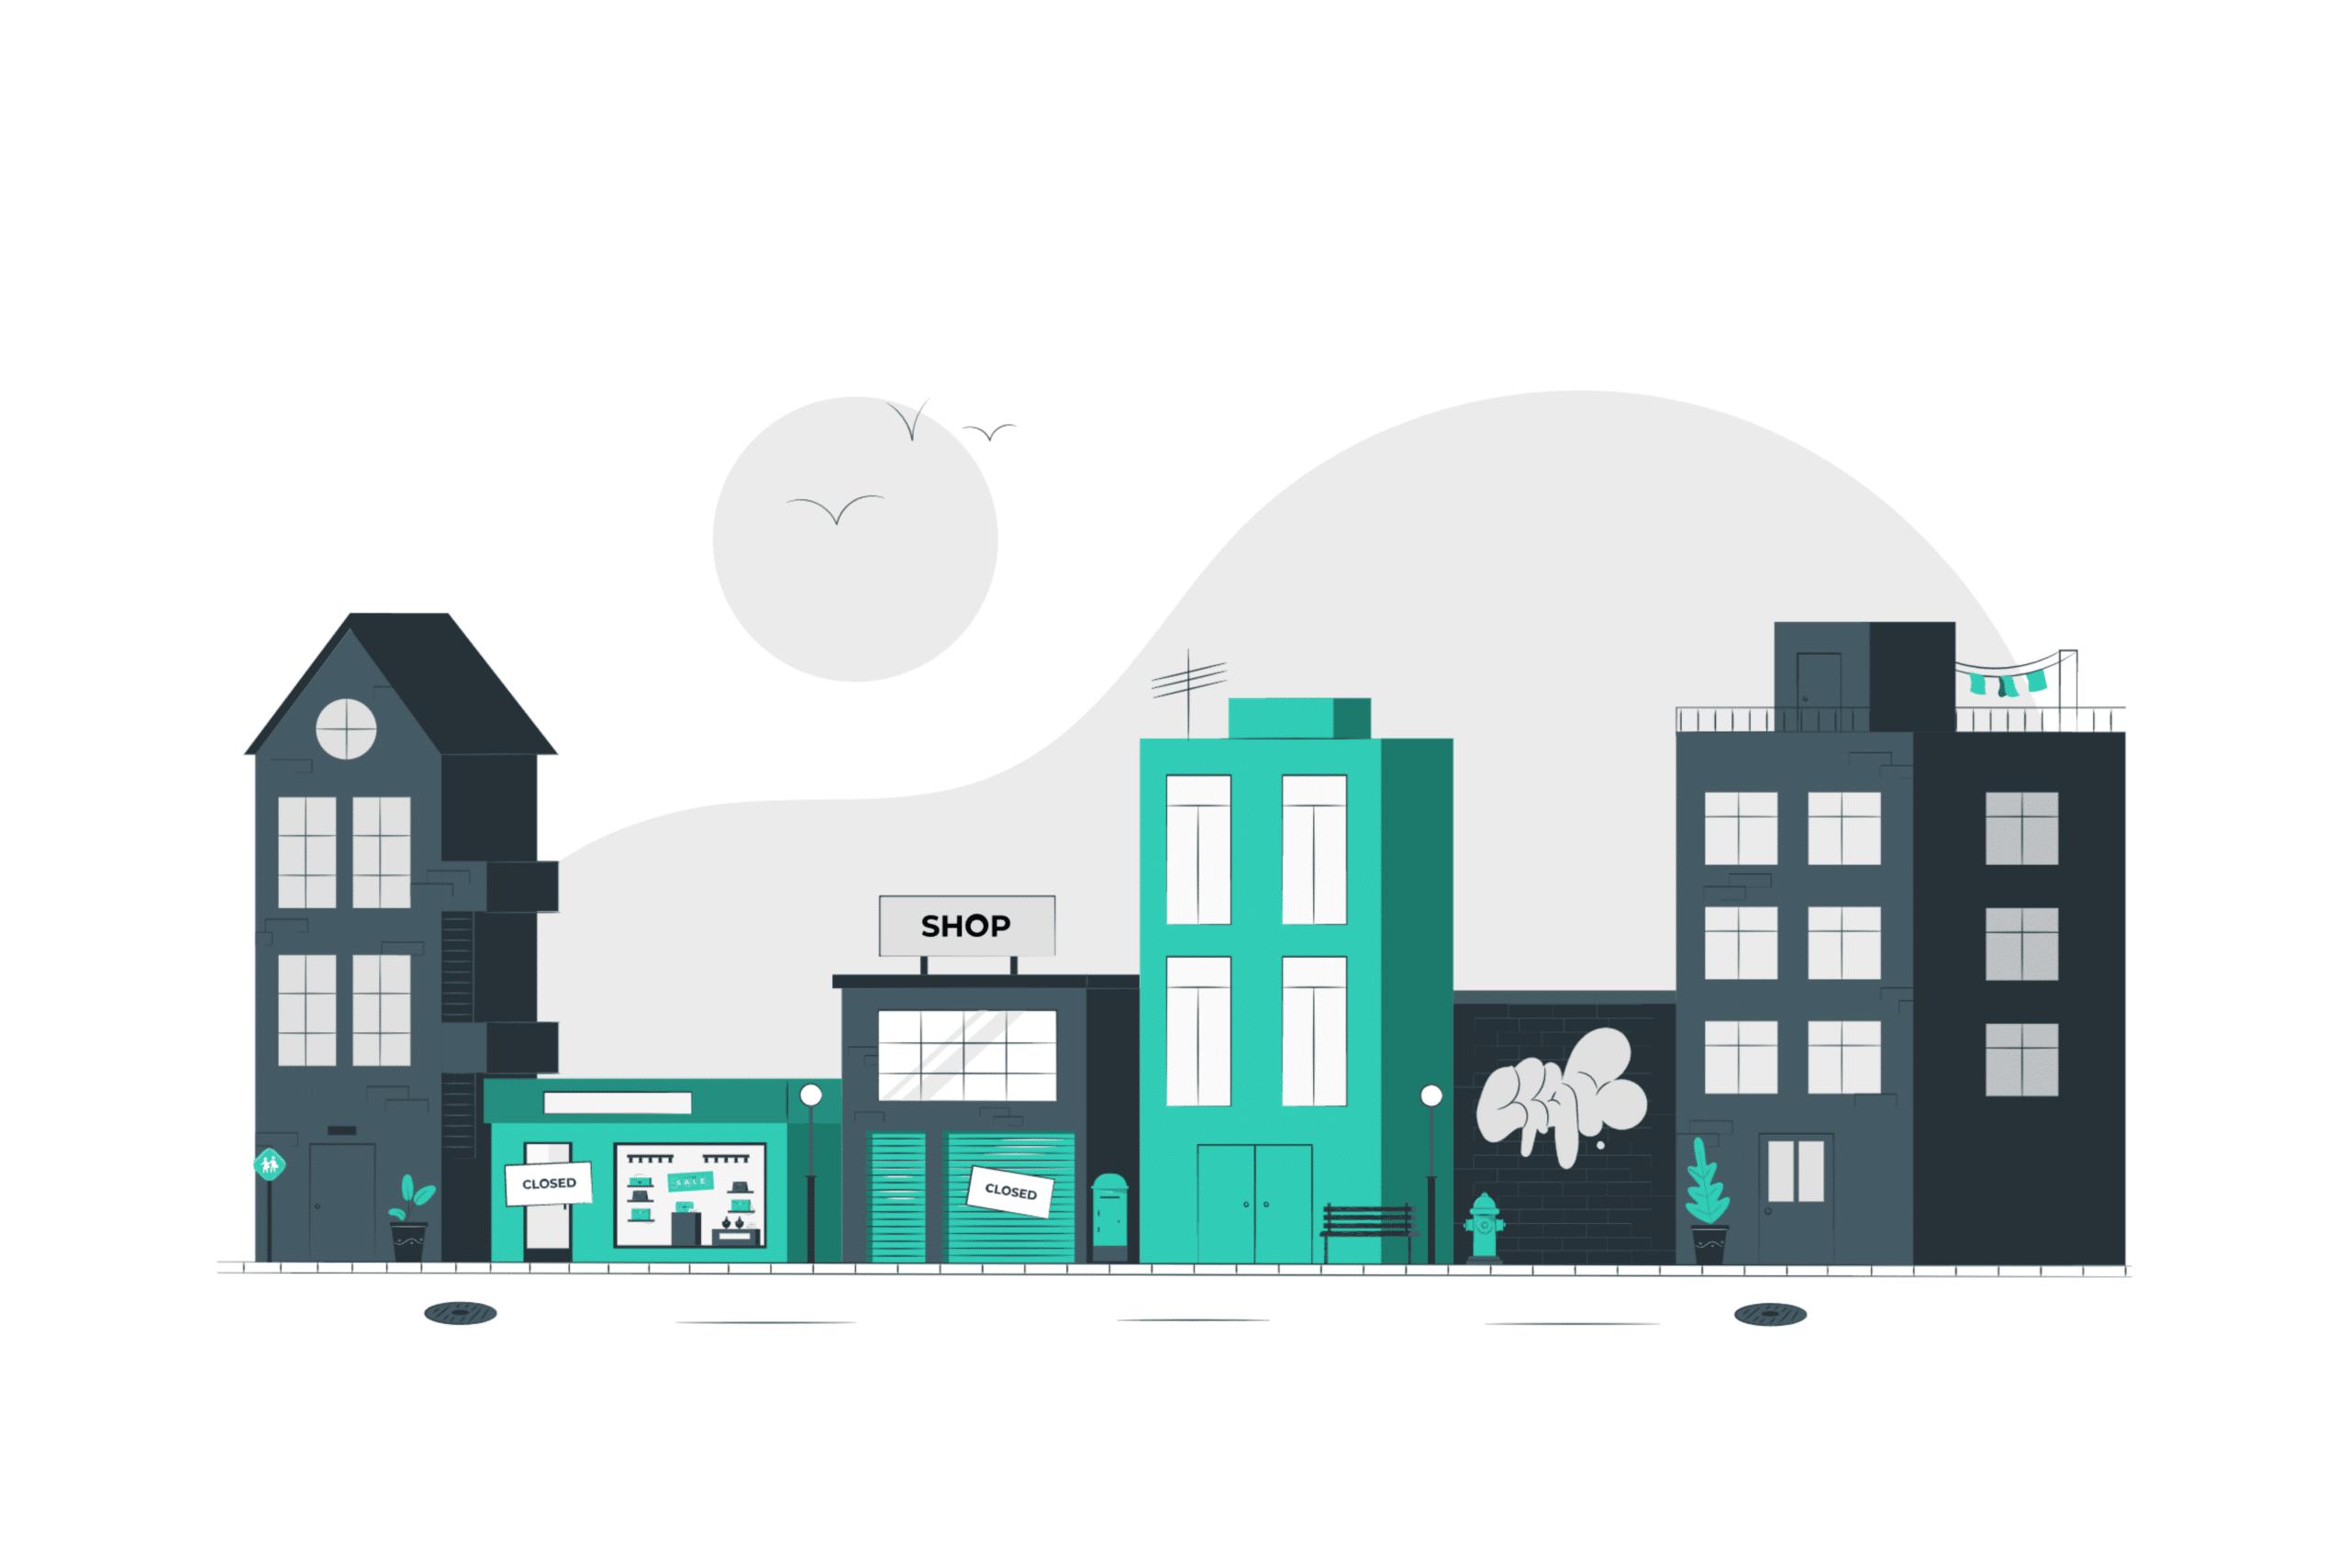 Illustration about commercial real estate management